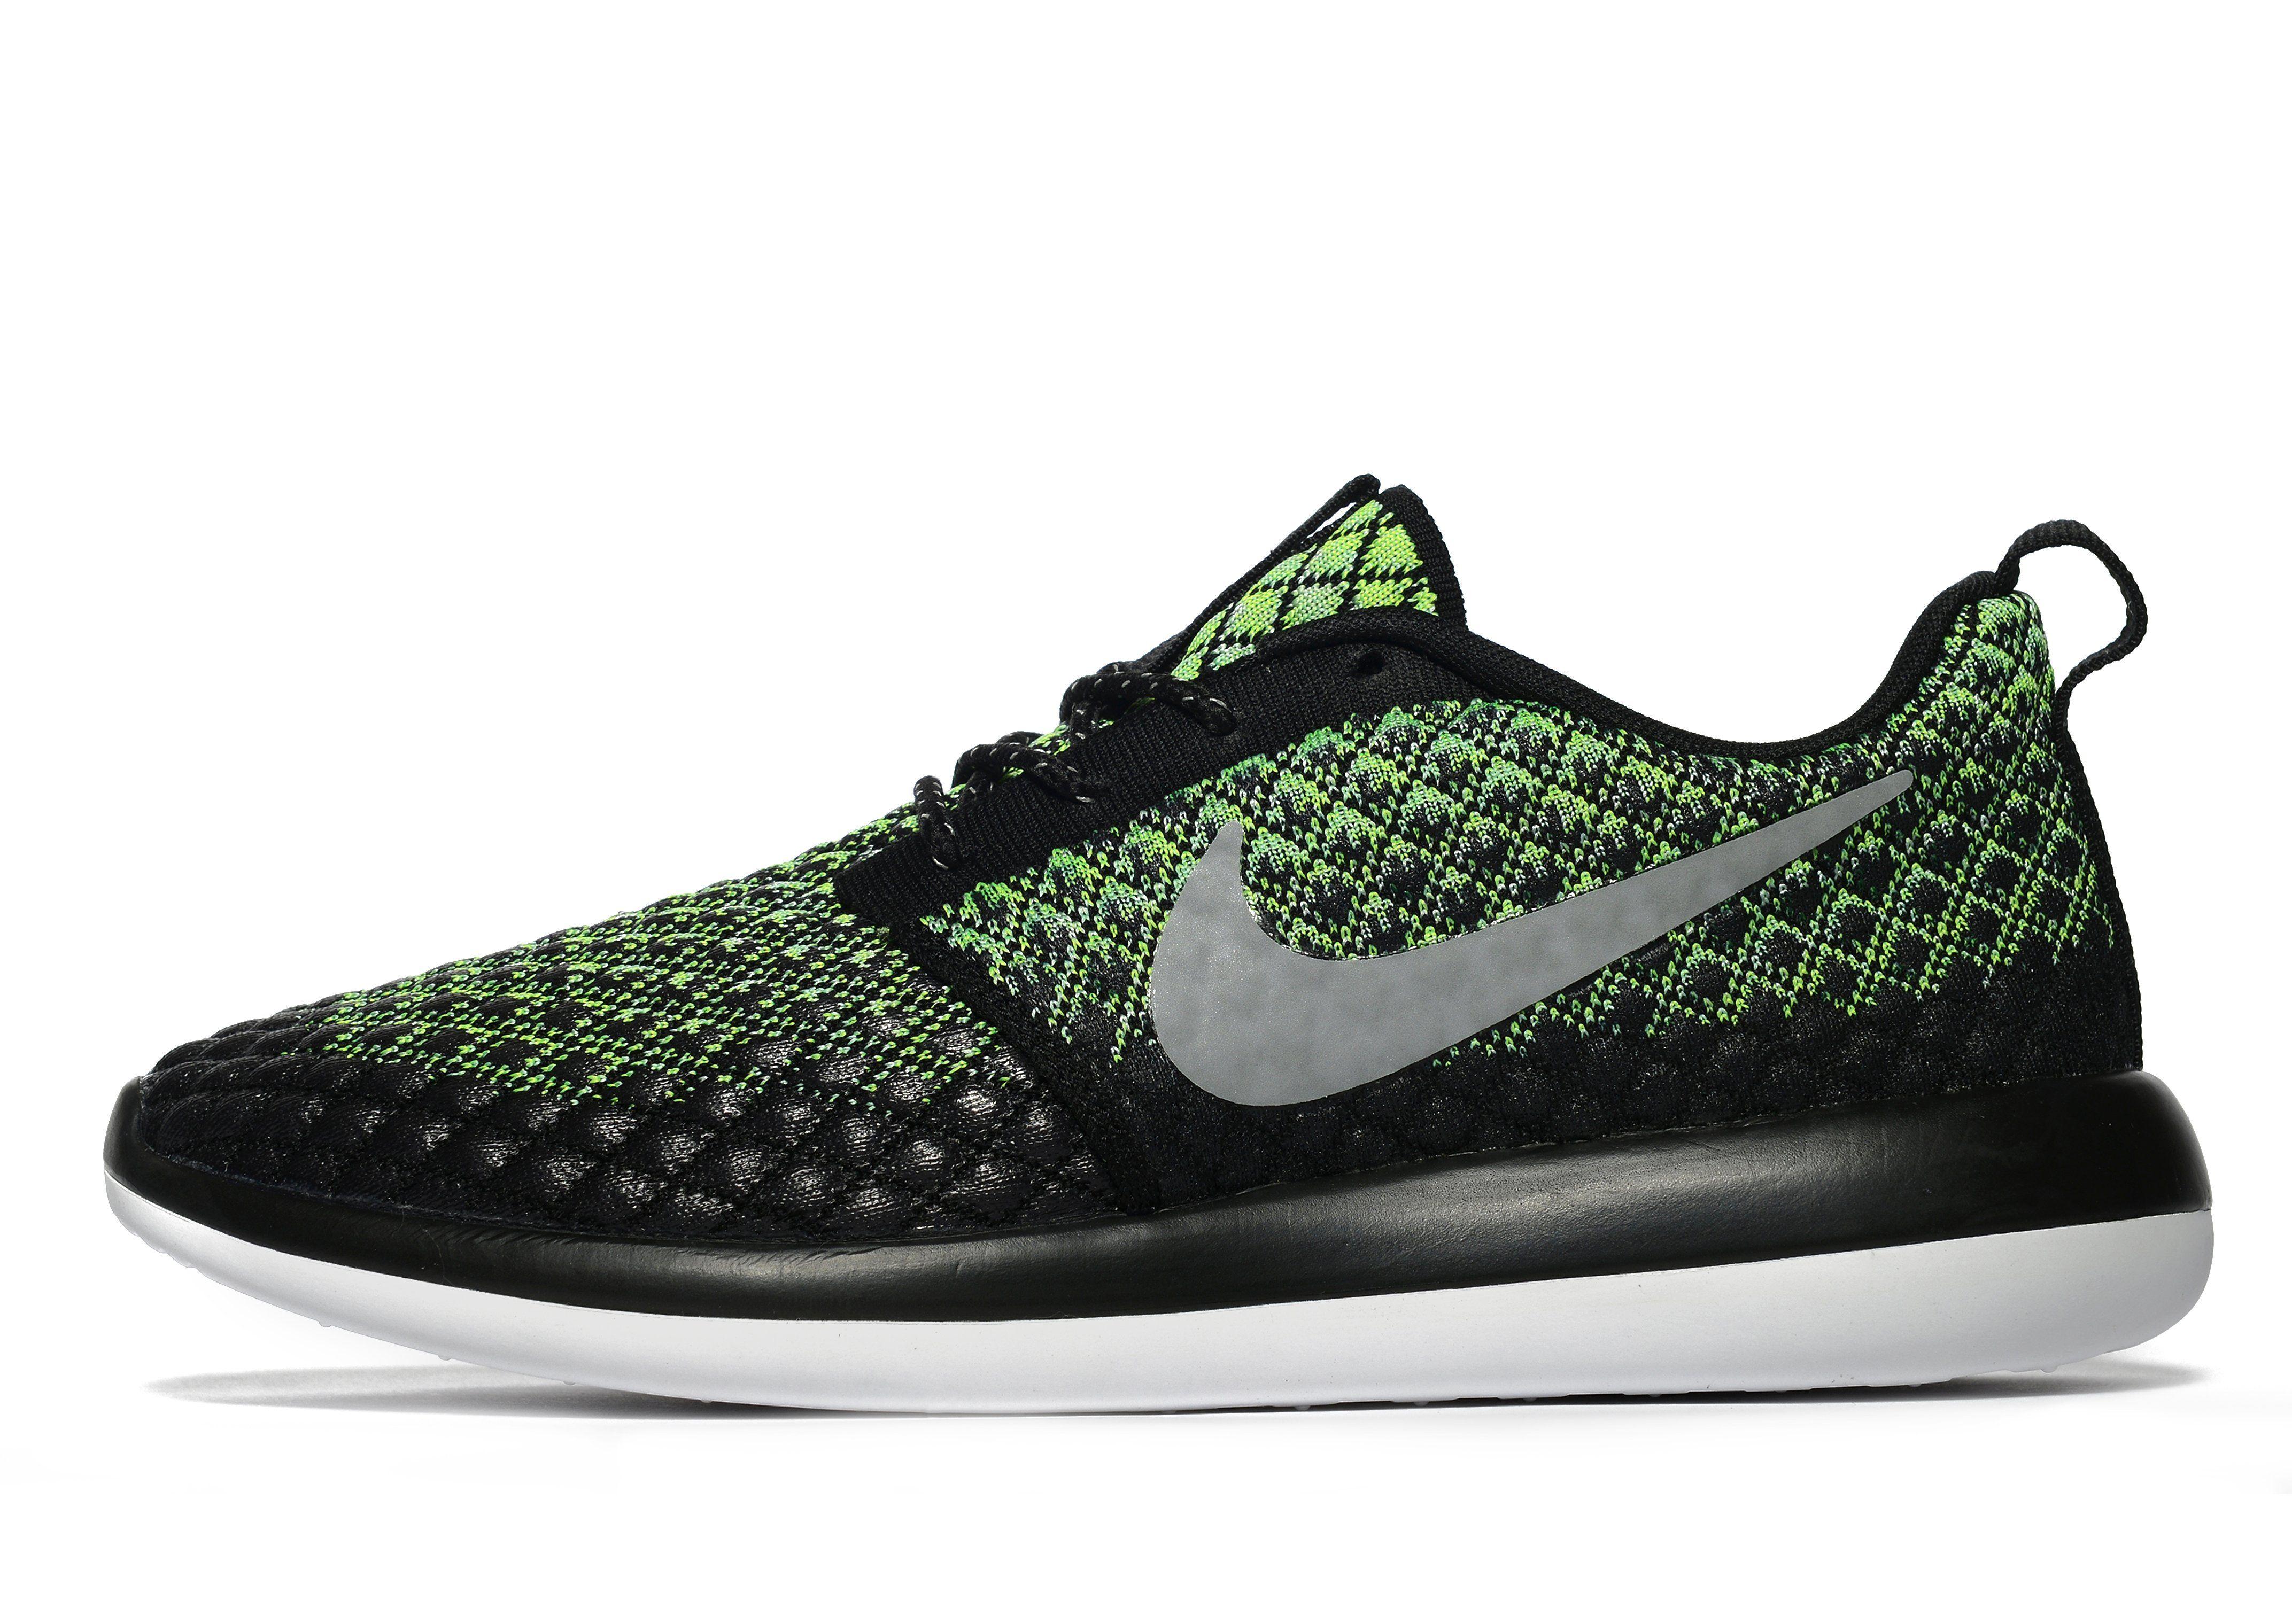 edba4394e31 high-quality Nike Roshe 2 Flyknit 365